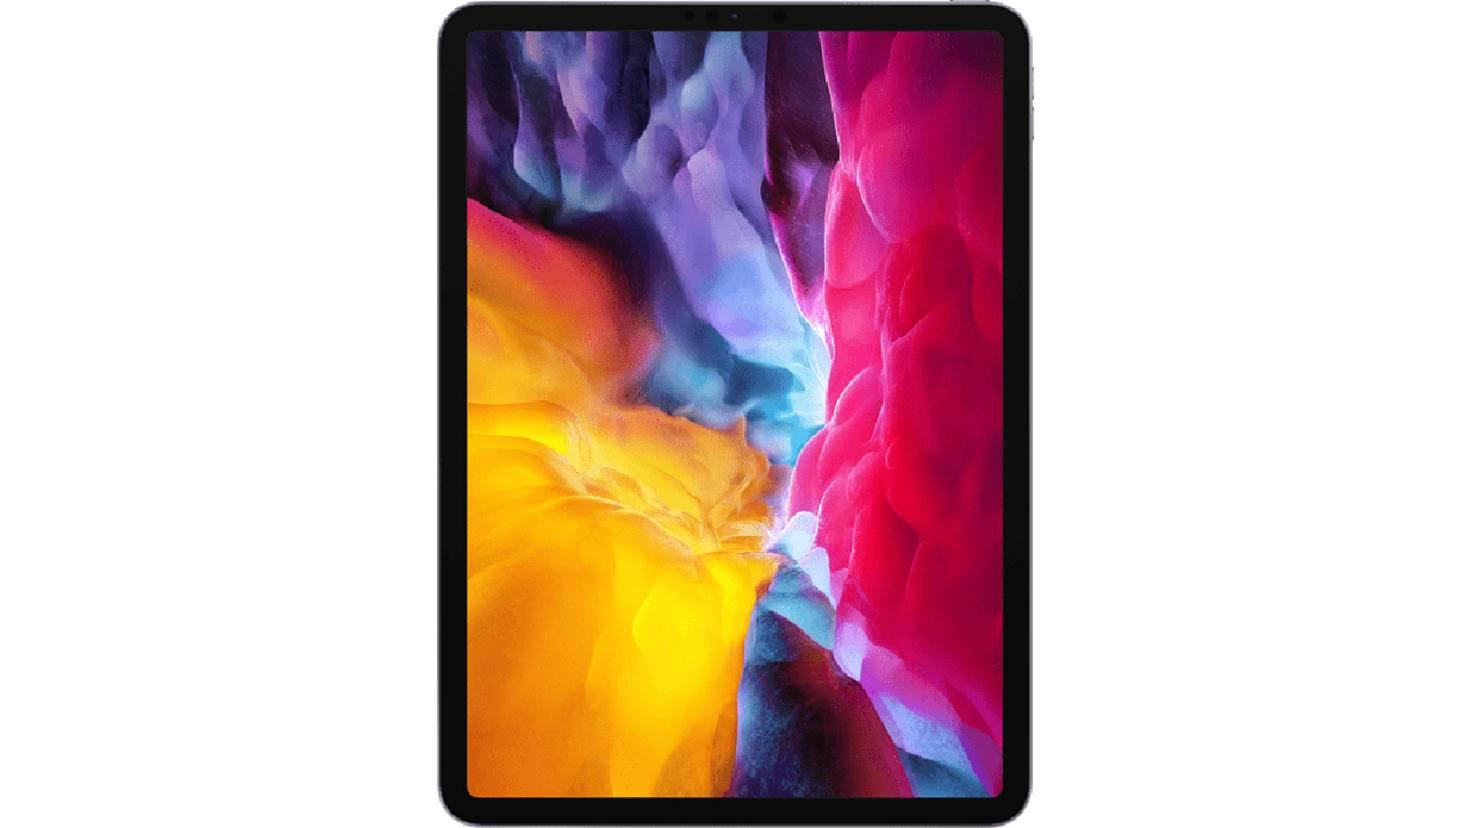 iPad Pro 11 inches